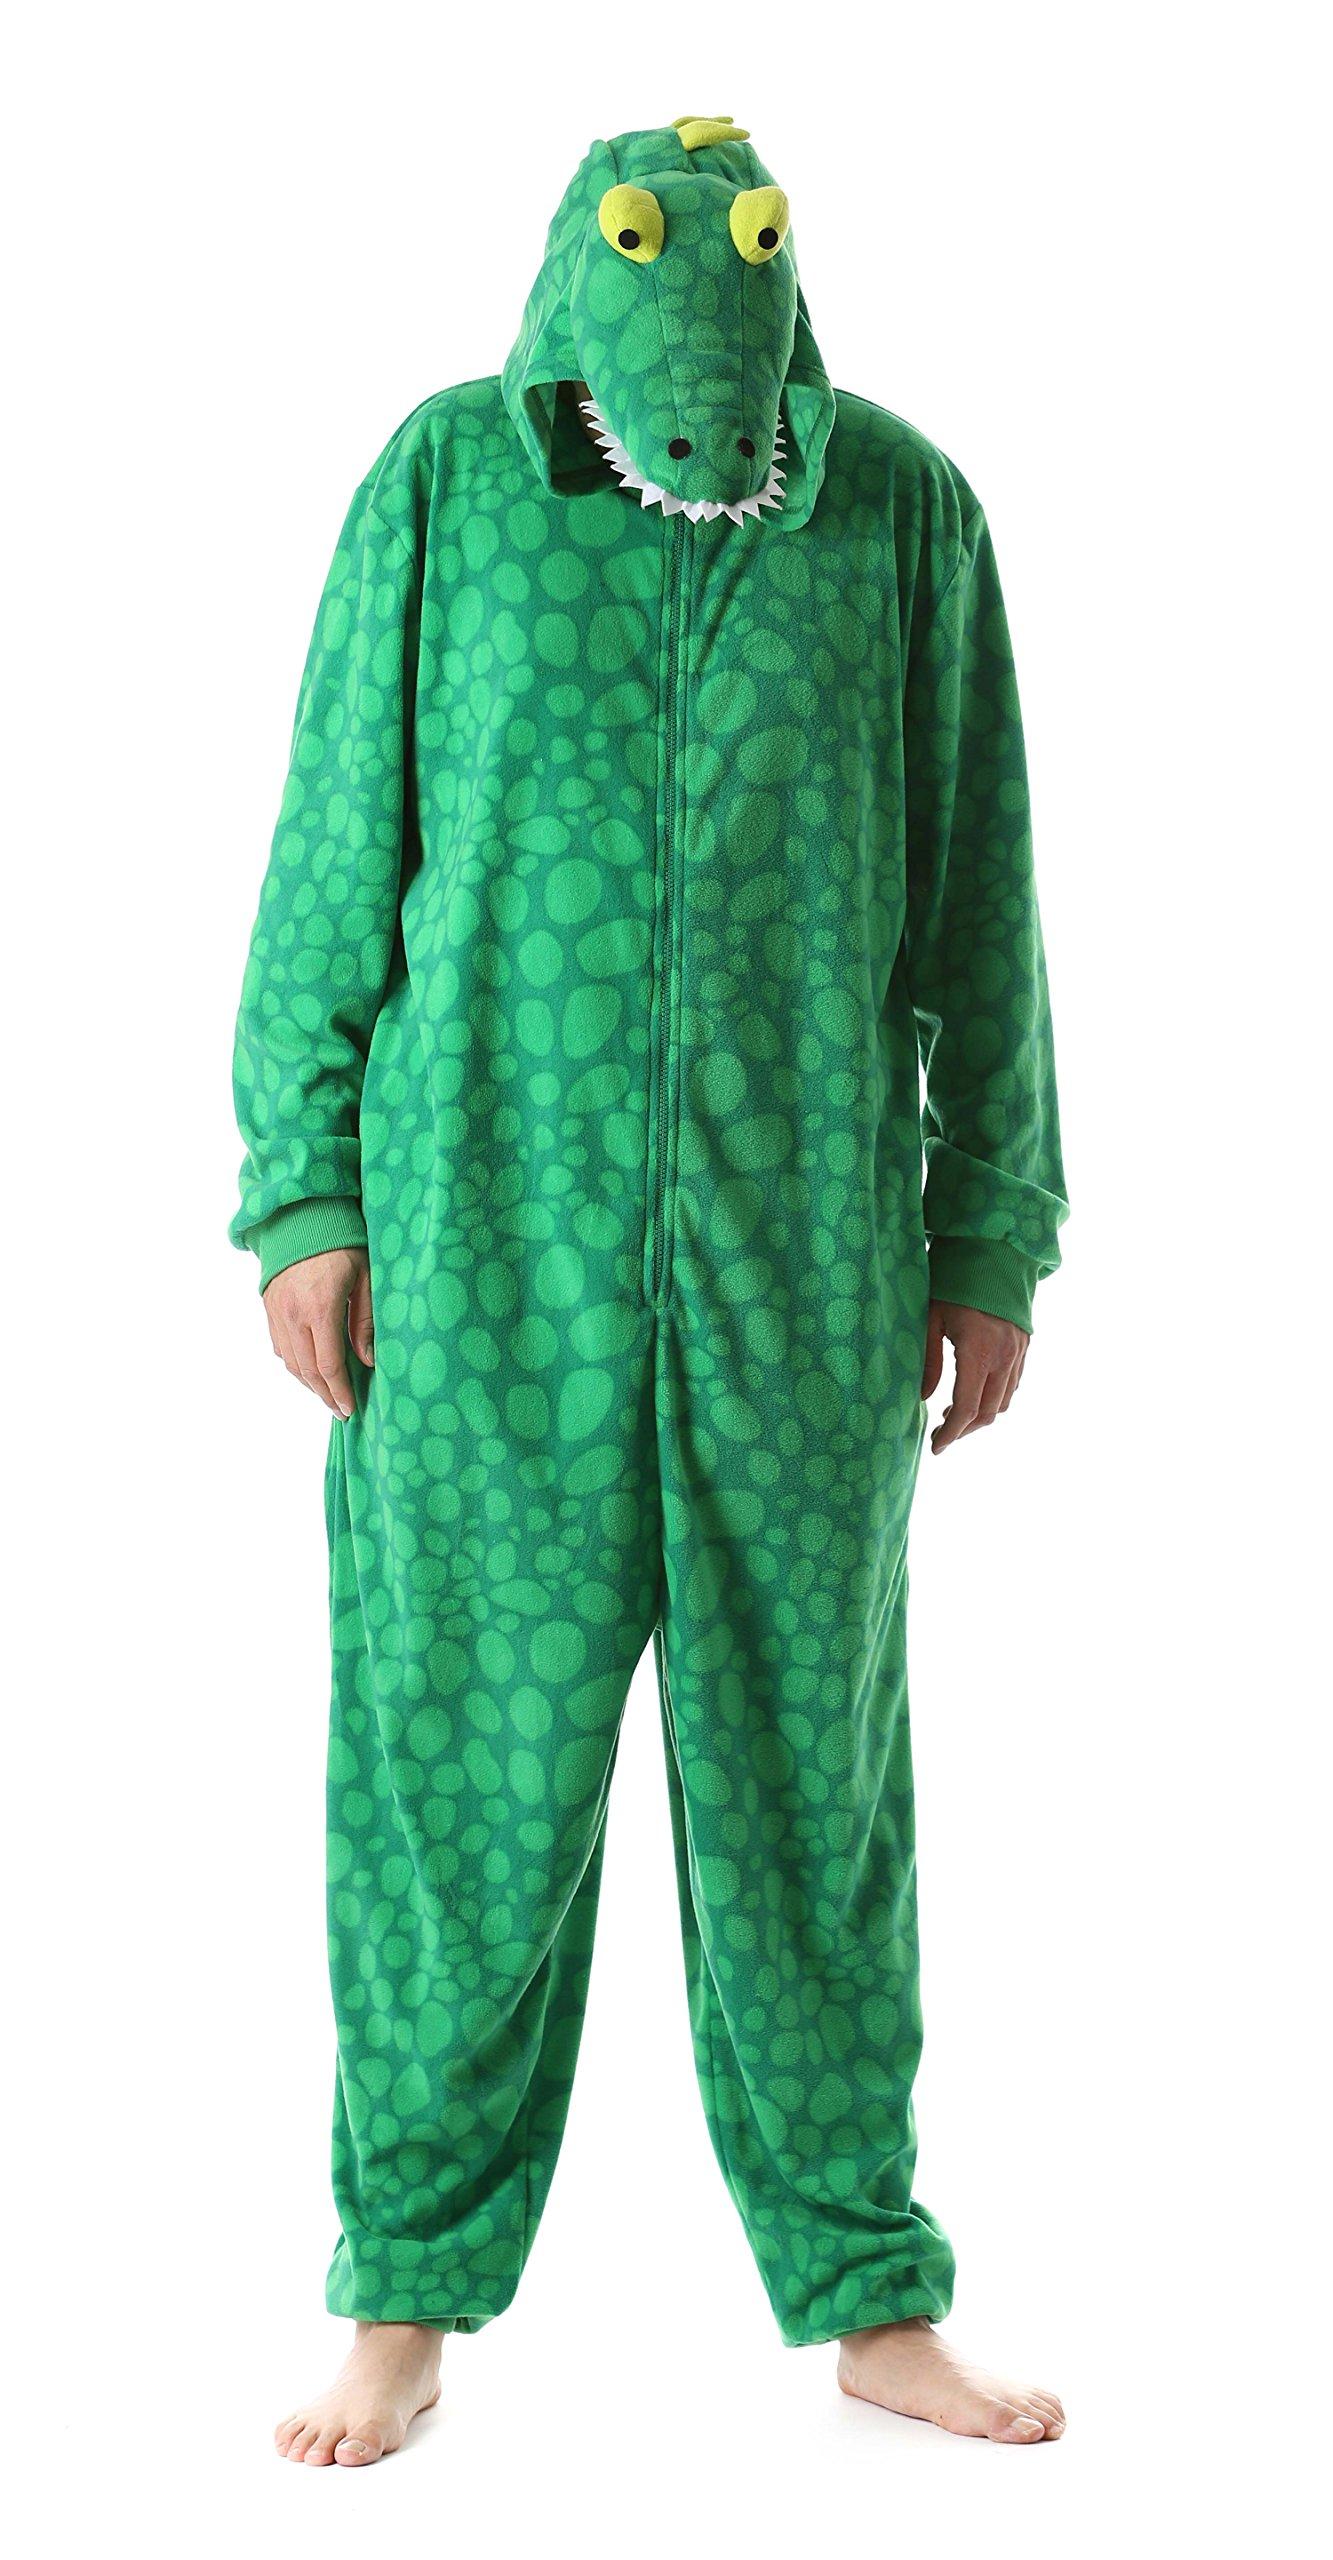 Just Love 6347-L Men's Adult Onesie Mens Pajamas, Gator, Large